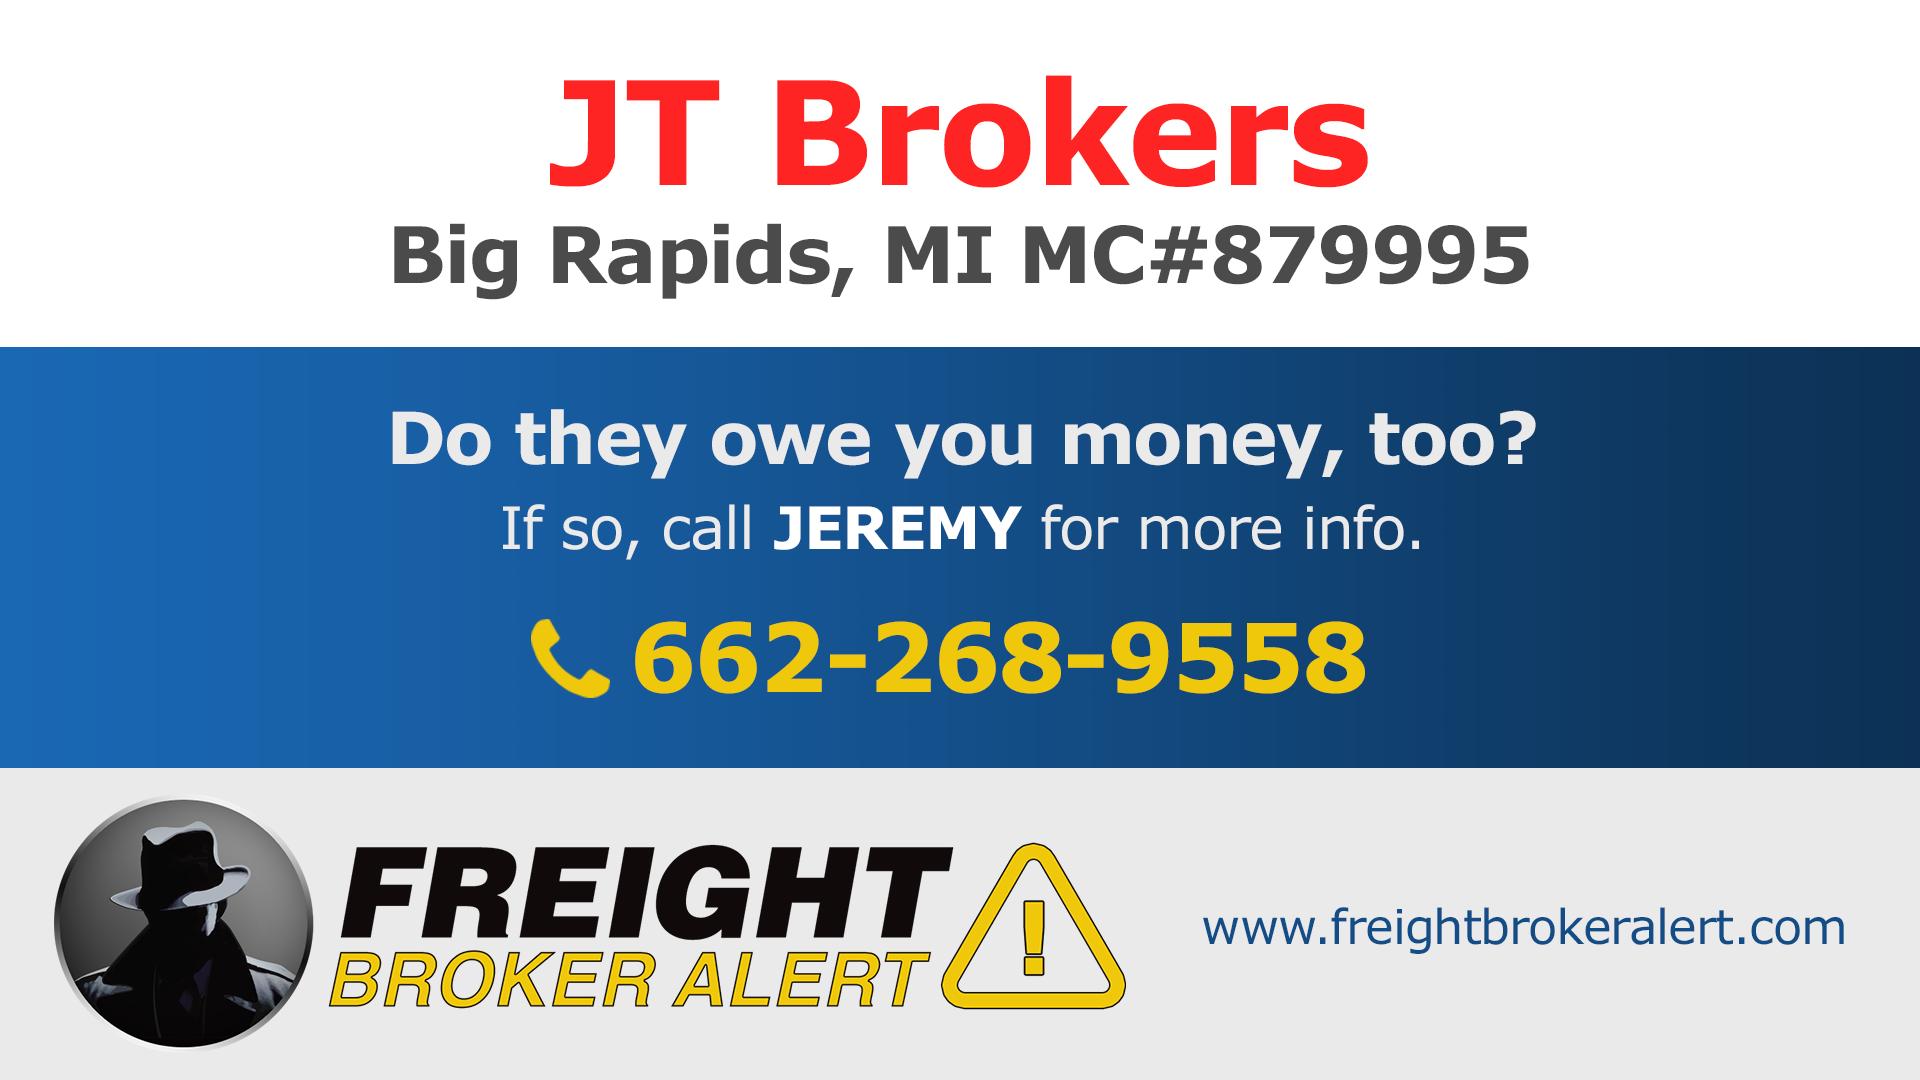 JT Brokers Michigan